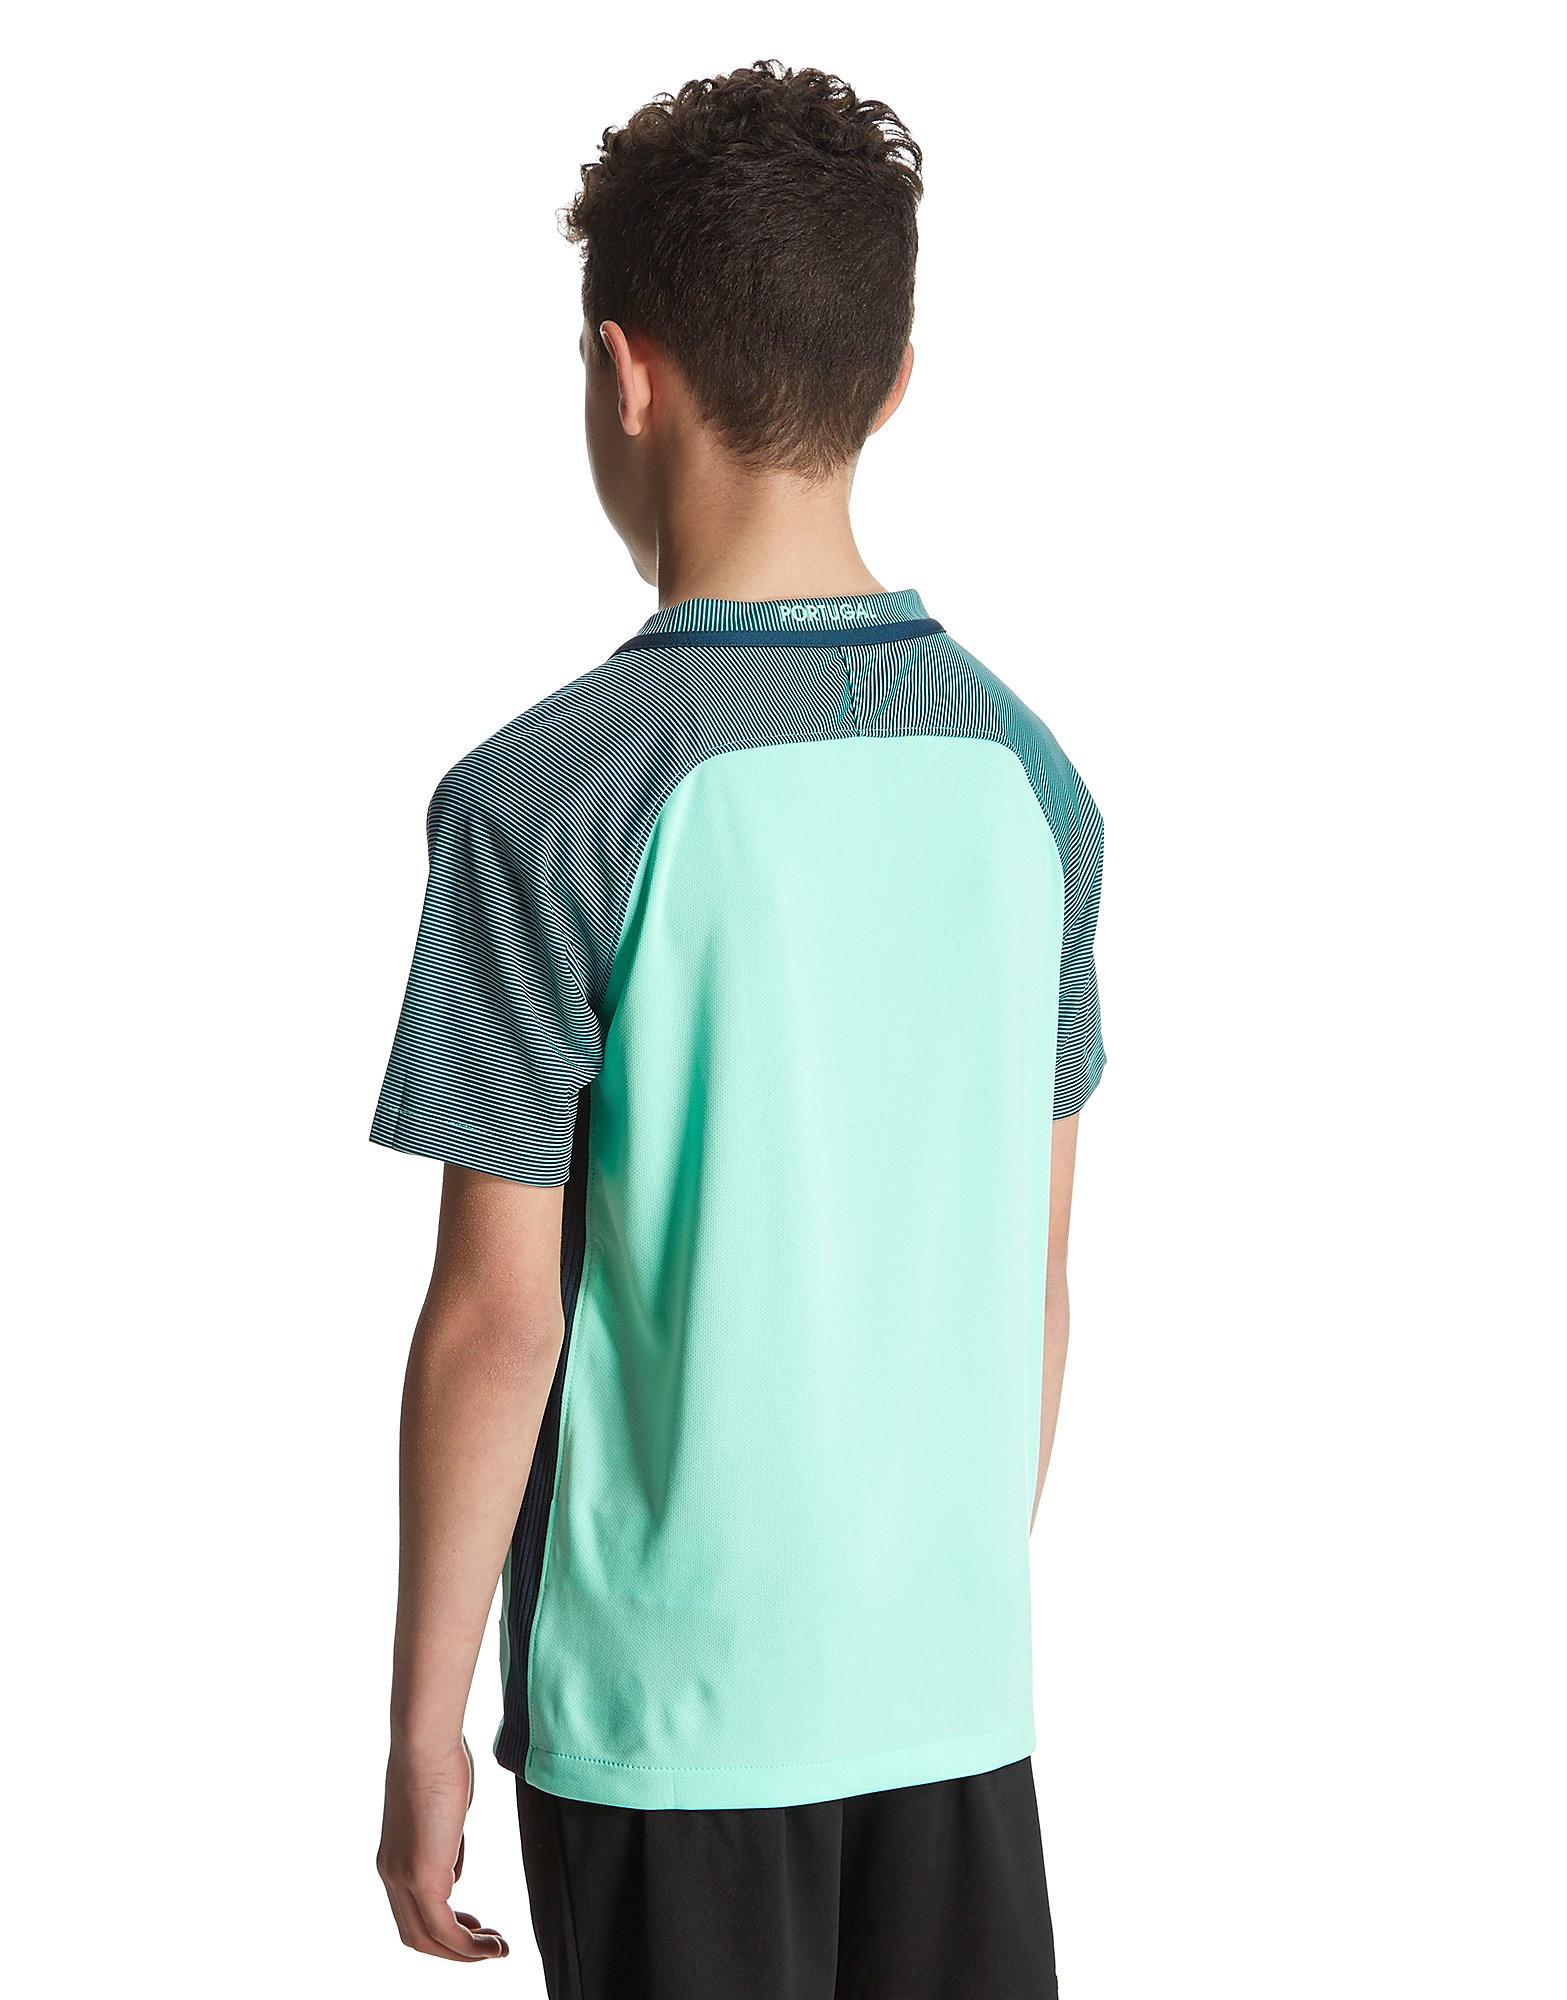 Nike Portugal 2016 Away Shirt Junior